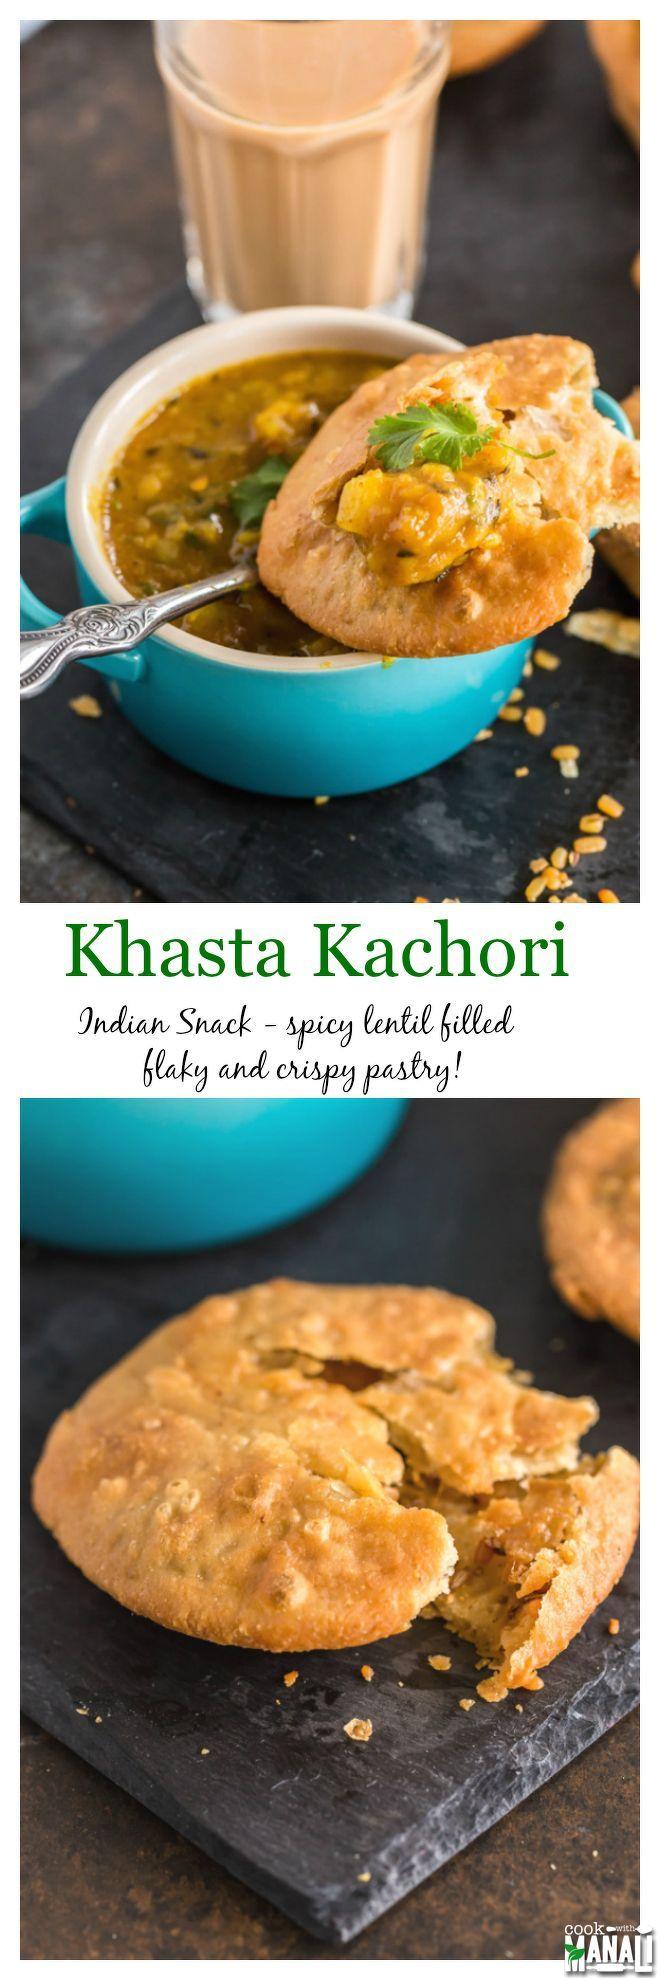 Authentic Khasta Kachori - Urad Dal Kachori - Cook With Manali, ,